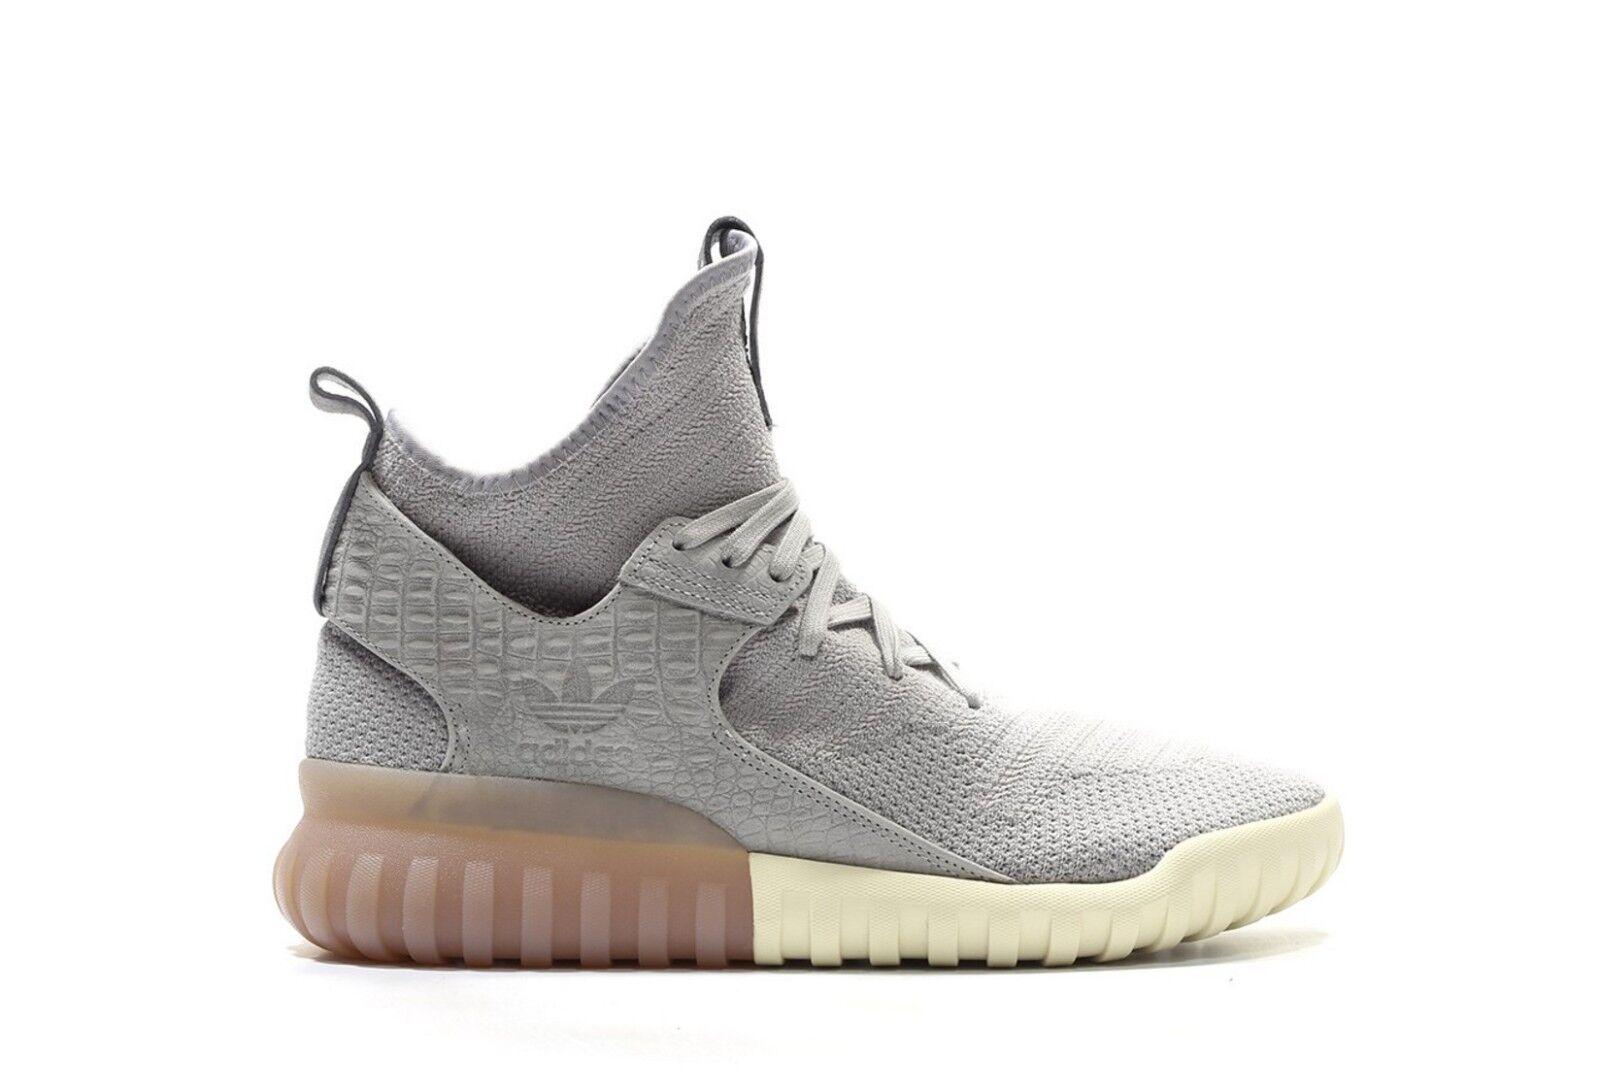 New! 12 Adidas Originals Tubular X Primeknit Shoes Gray White Gum Brown S74931